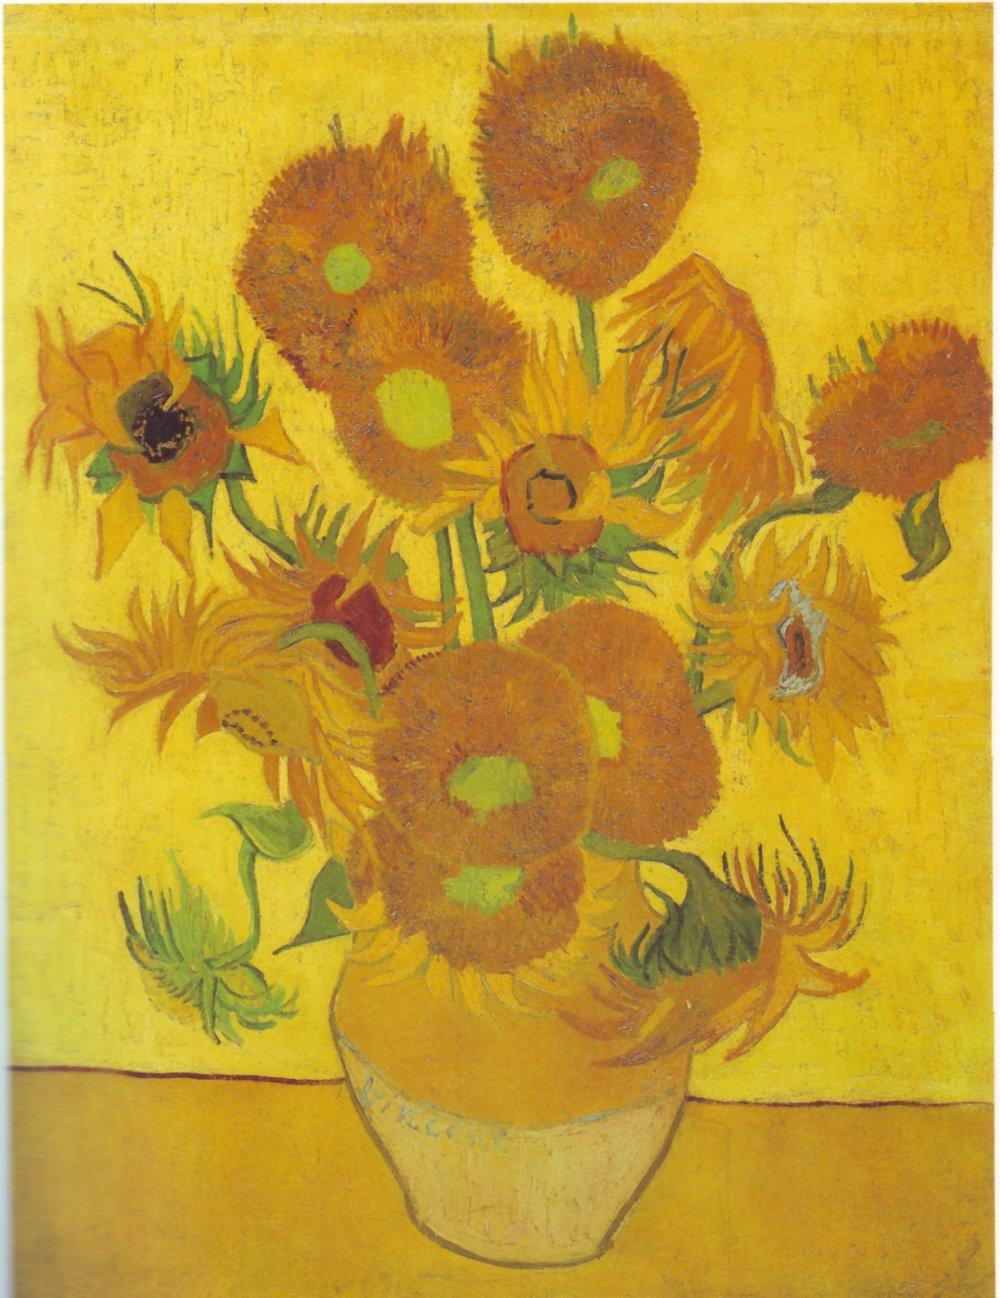 Vincent Van Gogh, Sunflowers Arles, 1888, oil on canvas, 92.5 x 73 cm, Vincent van Gogh Foundation / National Museum Vincent van Gogh, Amsterdam